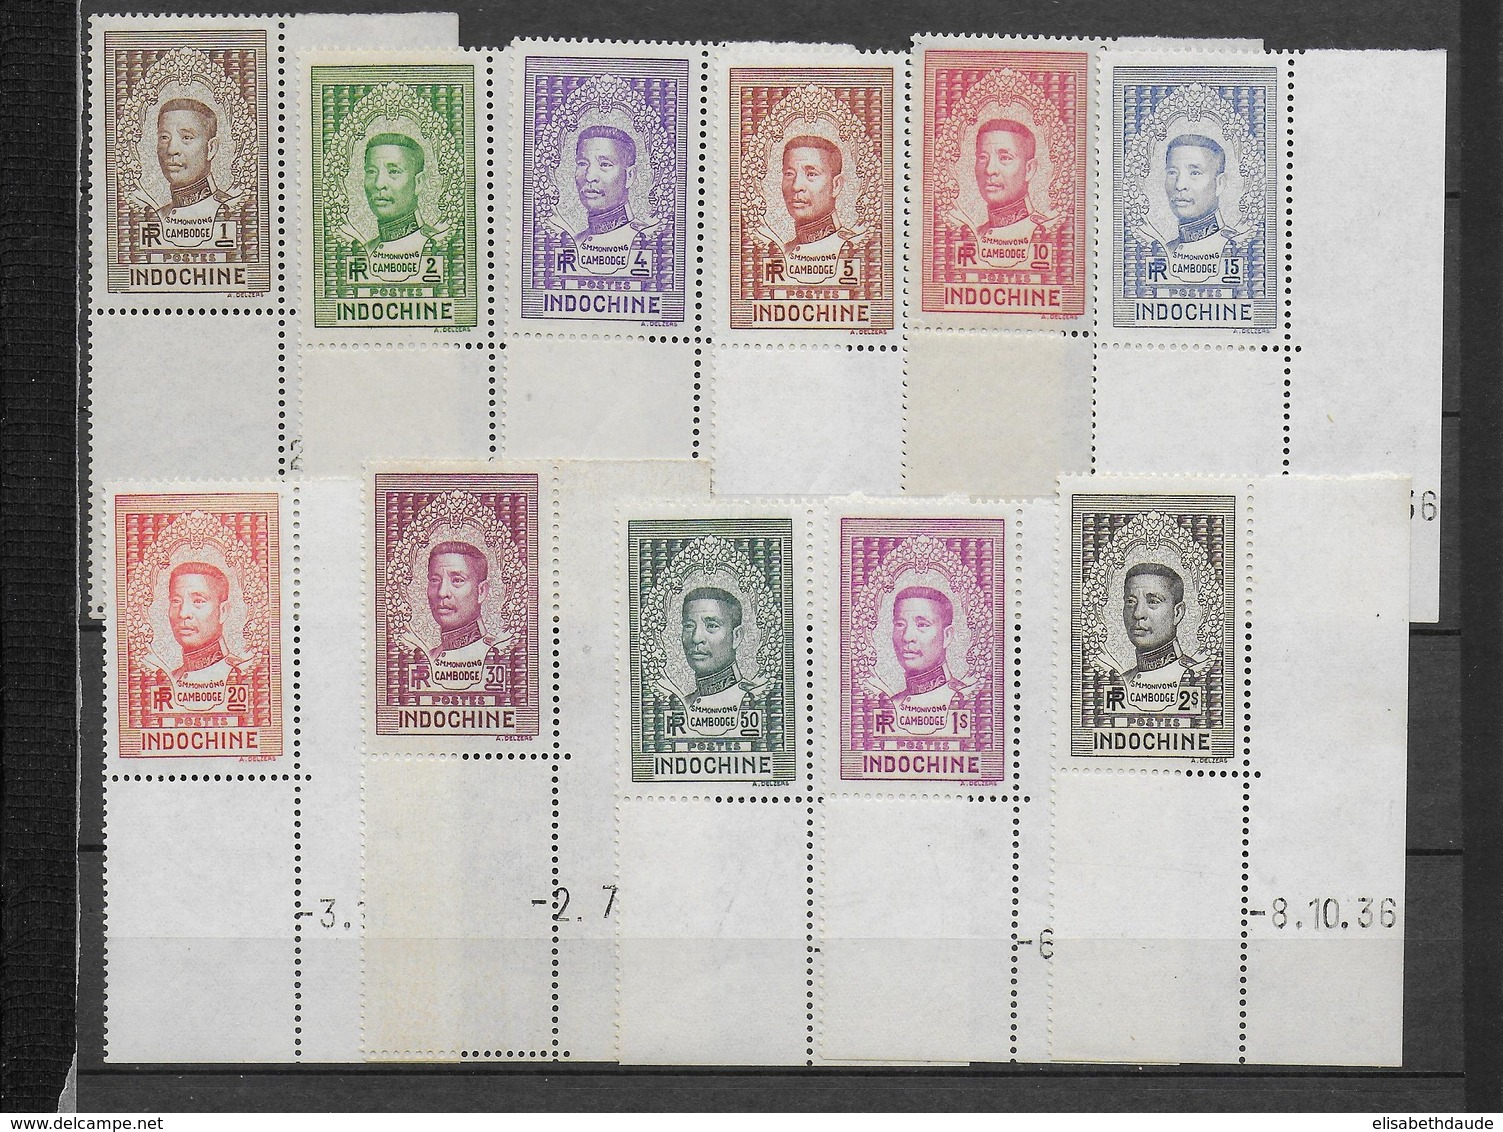 INDOCHINE - 1936 - YVERT 182/192 ** MNH BORD DE FEUILLE COIN DATE - COTE = 44 EUR. - Neufs